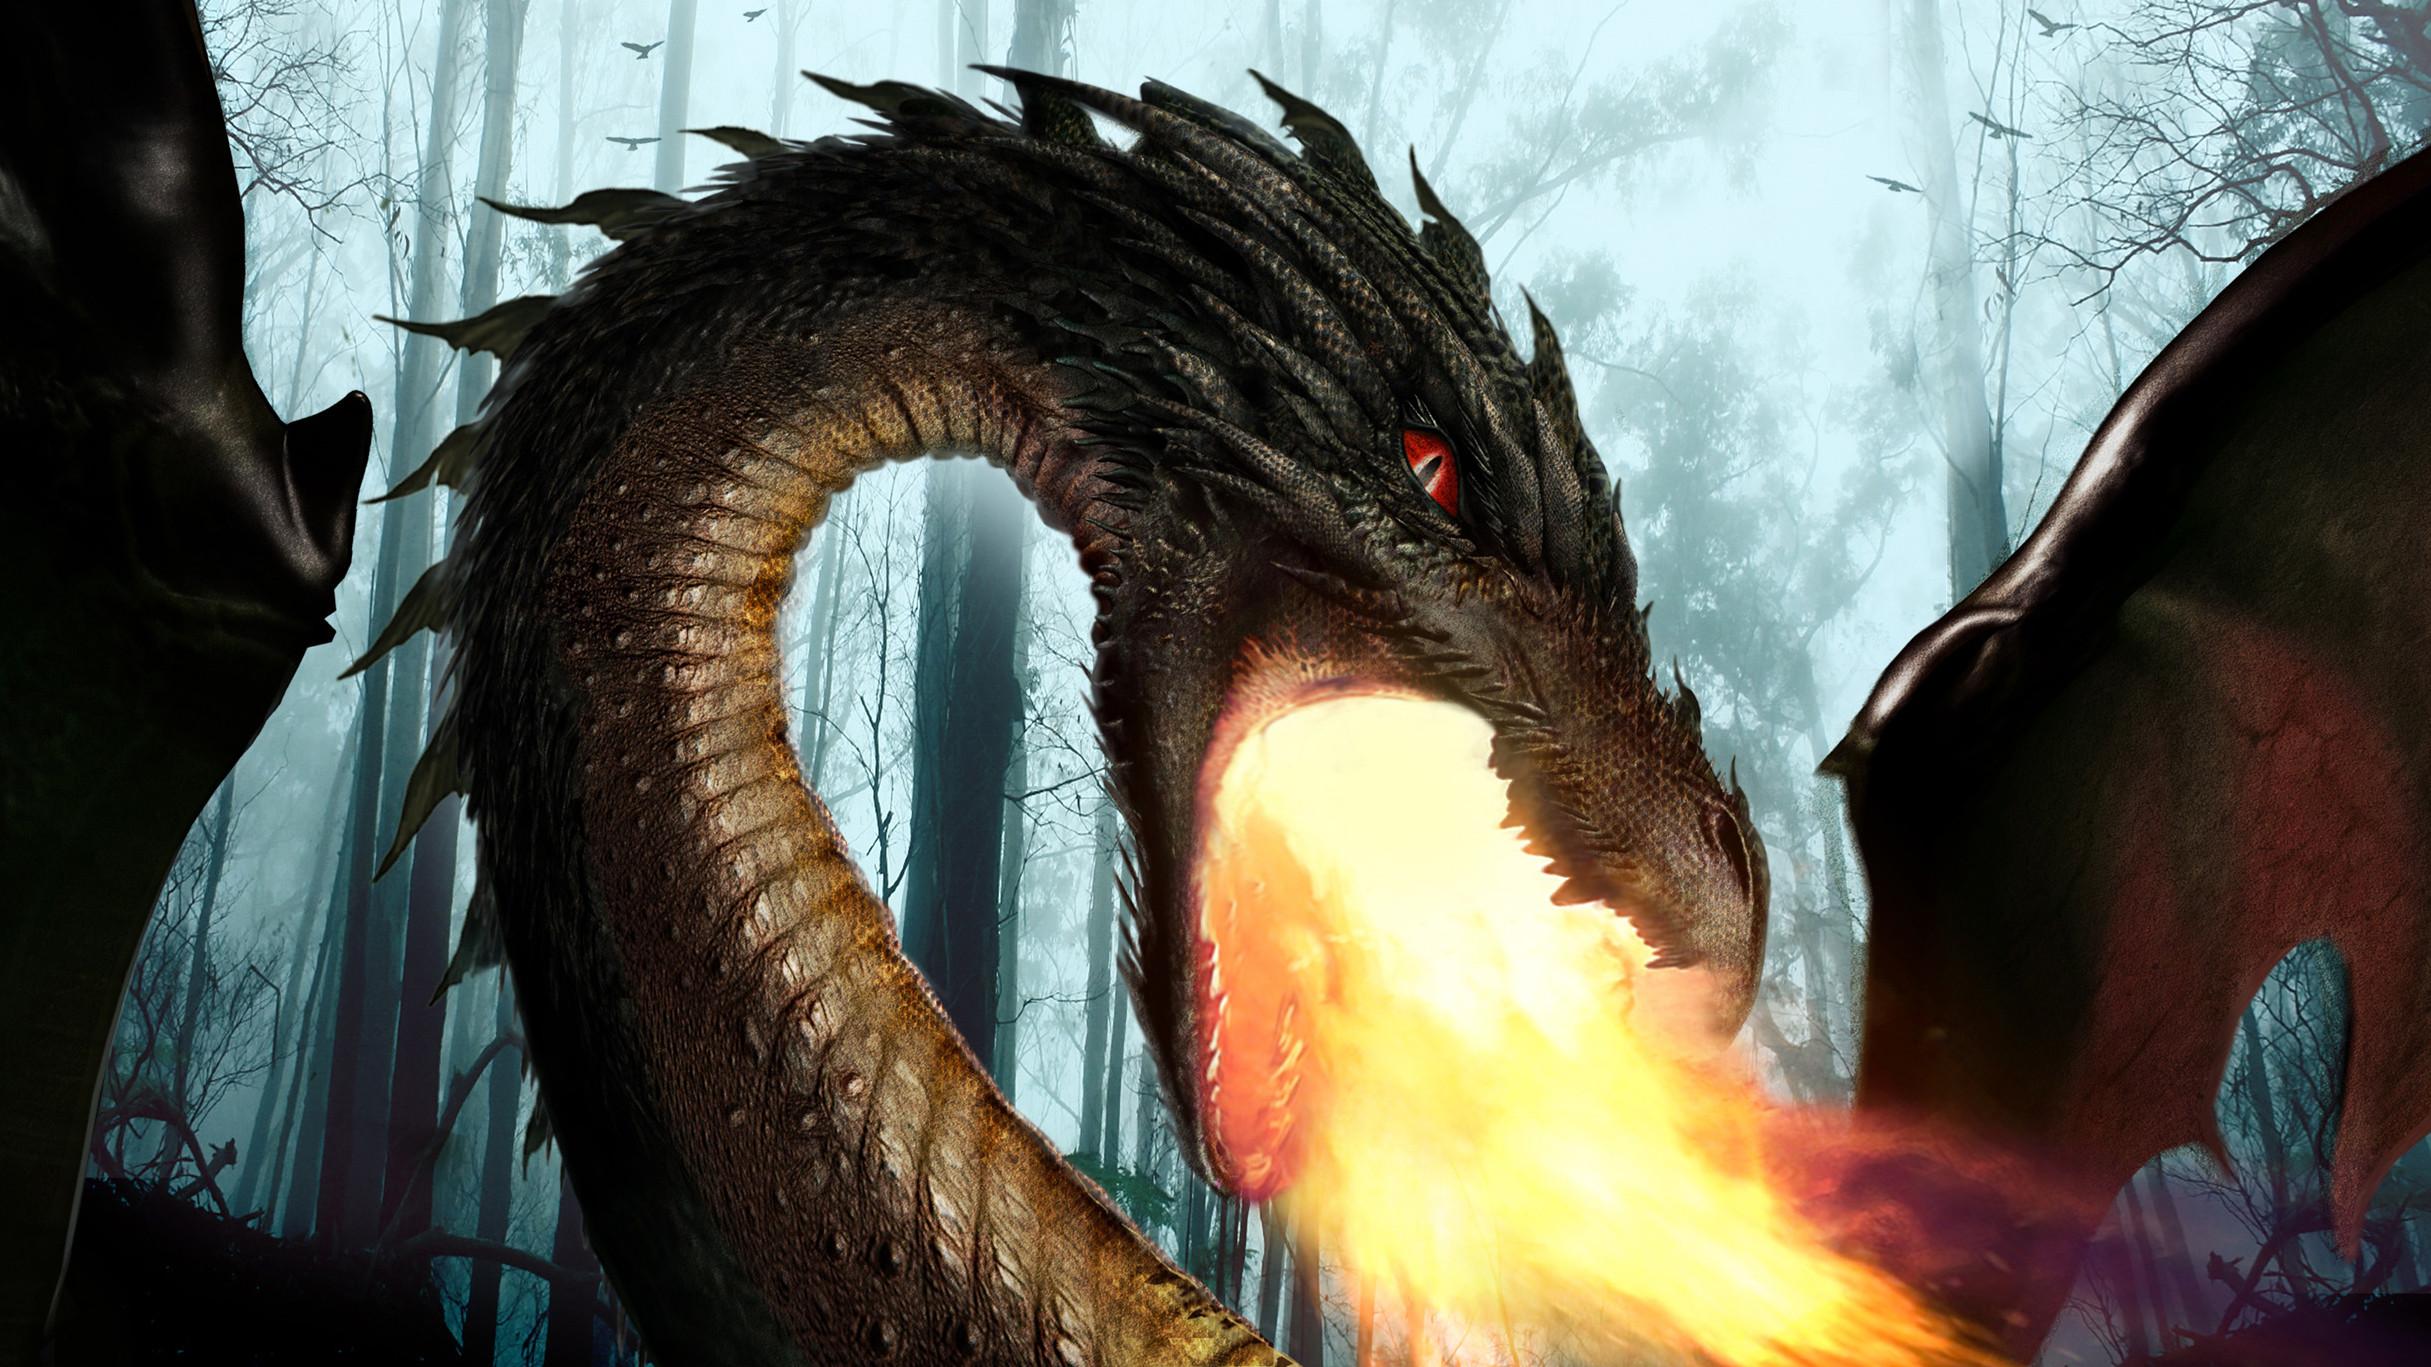 Closeup; Lily the Dragon Concept - Once Upon  a Time Season 5